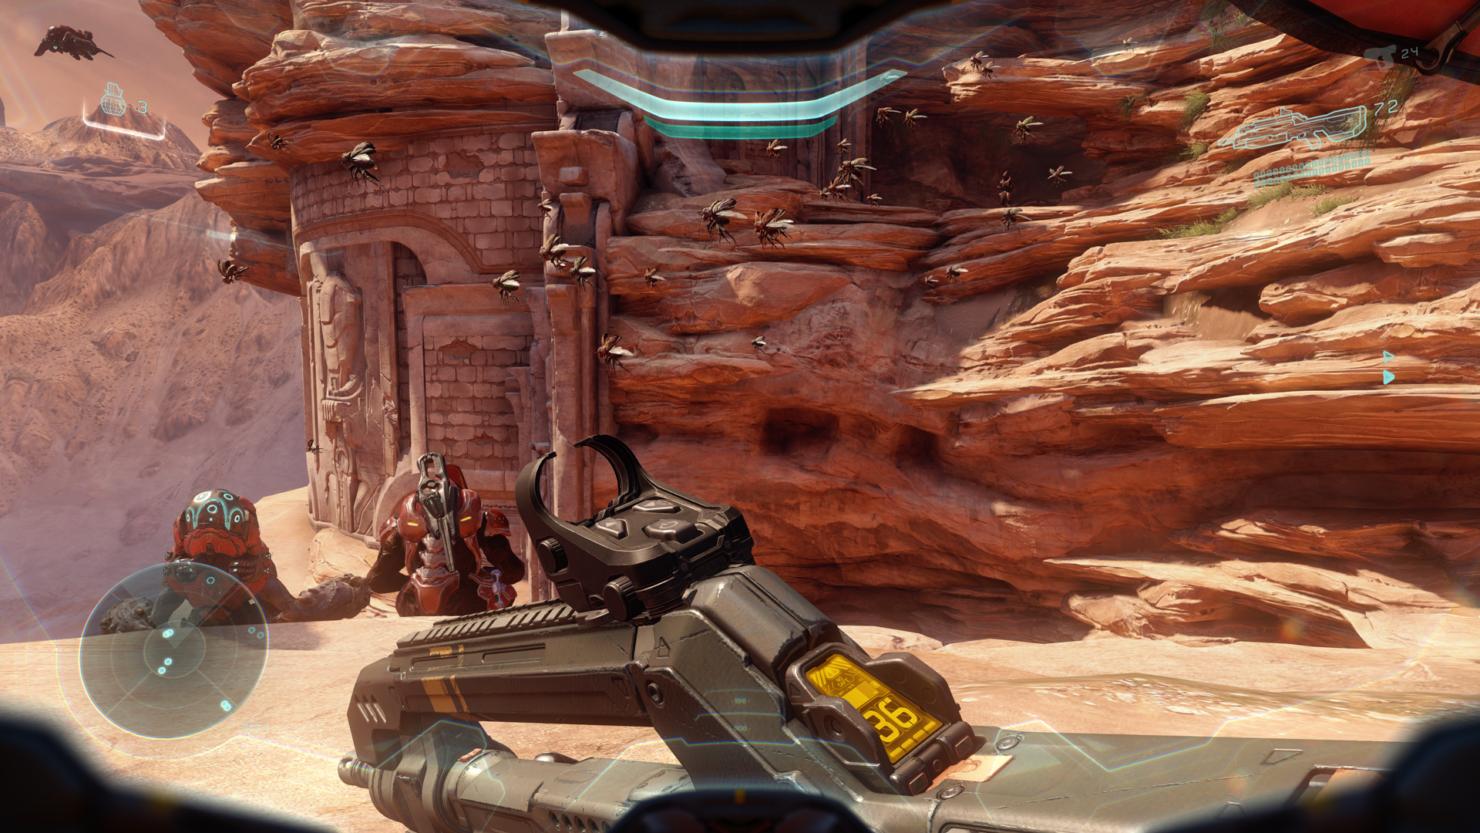 Halo 5 Xbox One X update 1080p 4